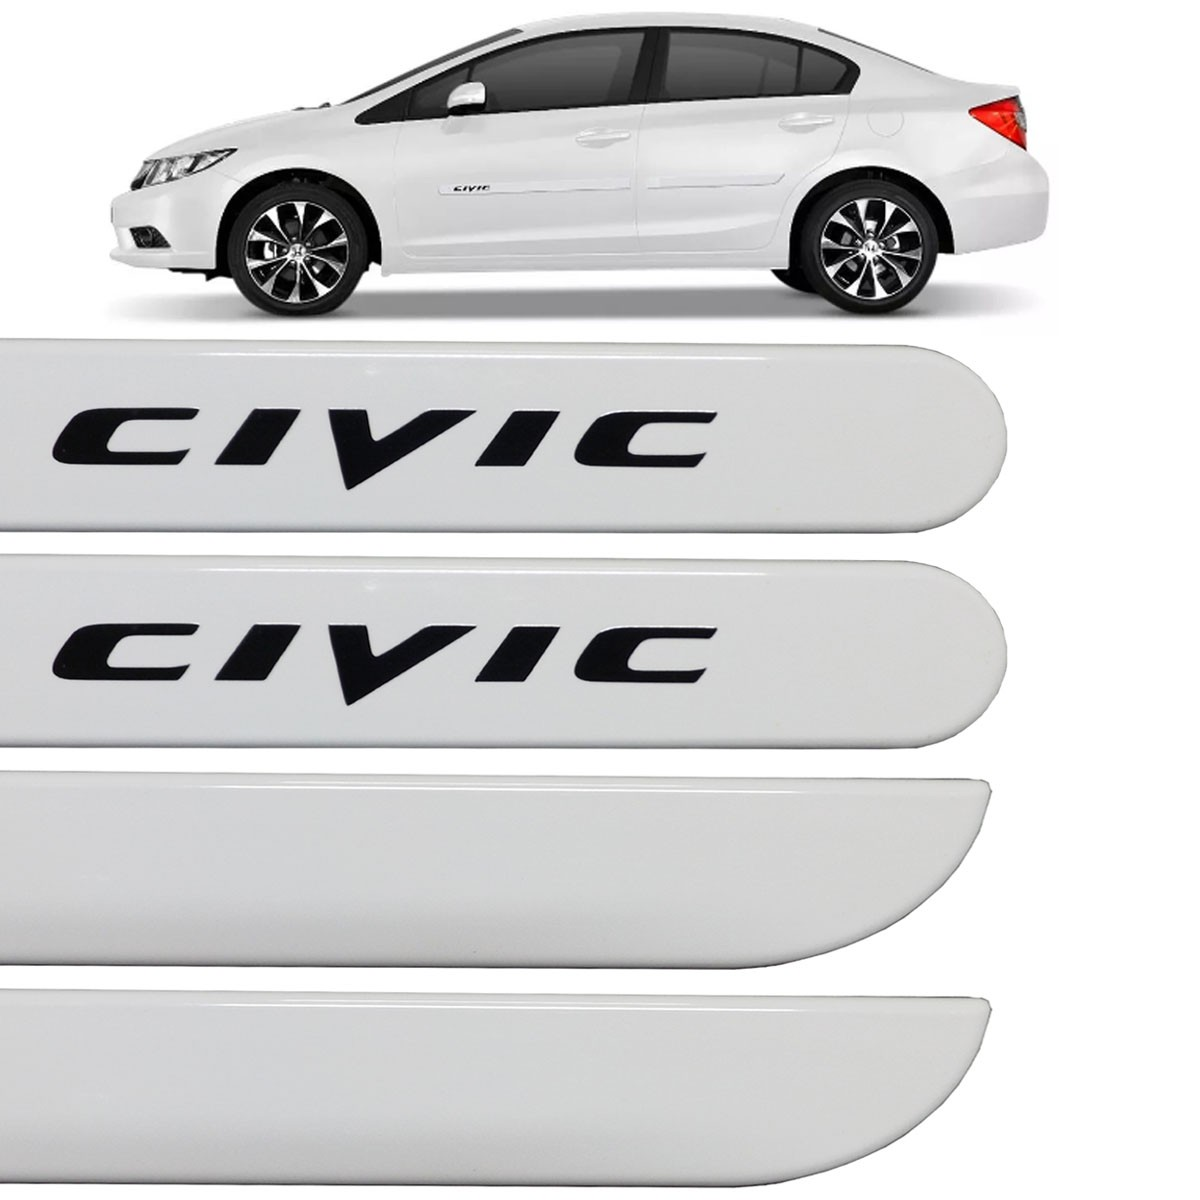 Jogo Friso Lateral New Civic 2012 até 2017 Branco Taffeta